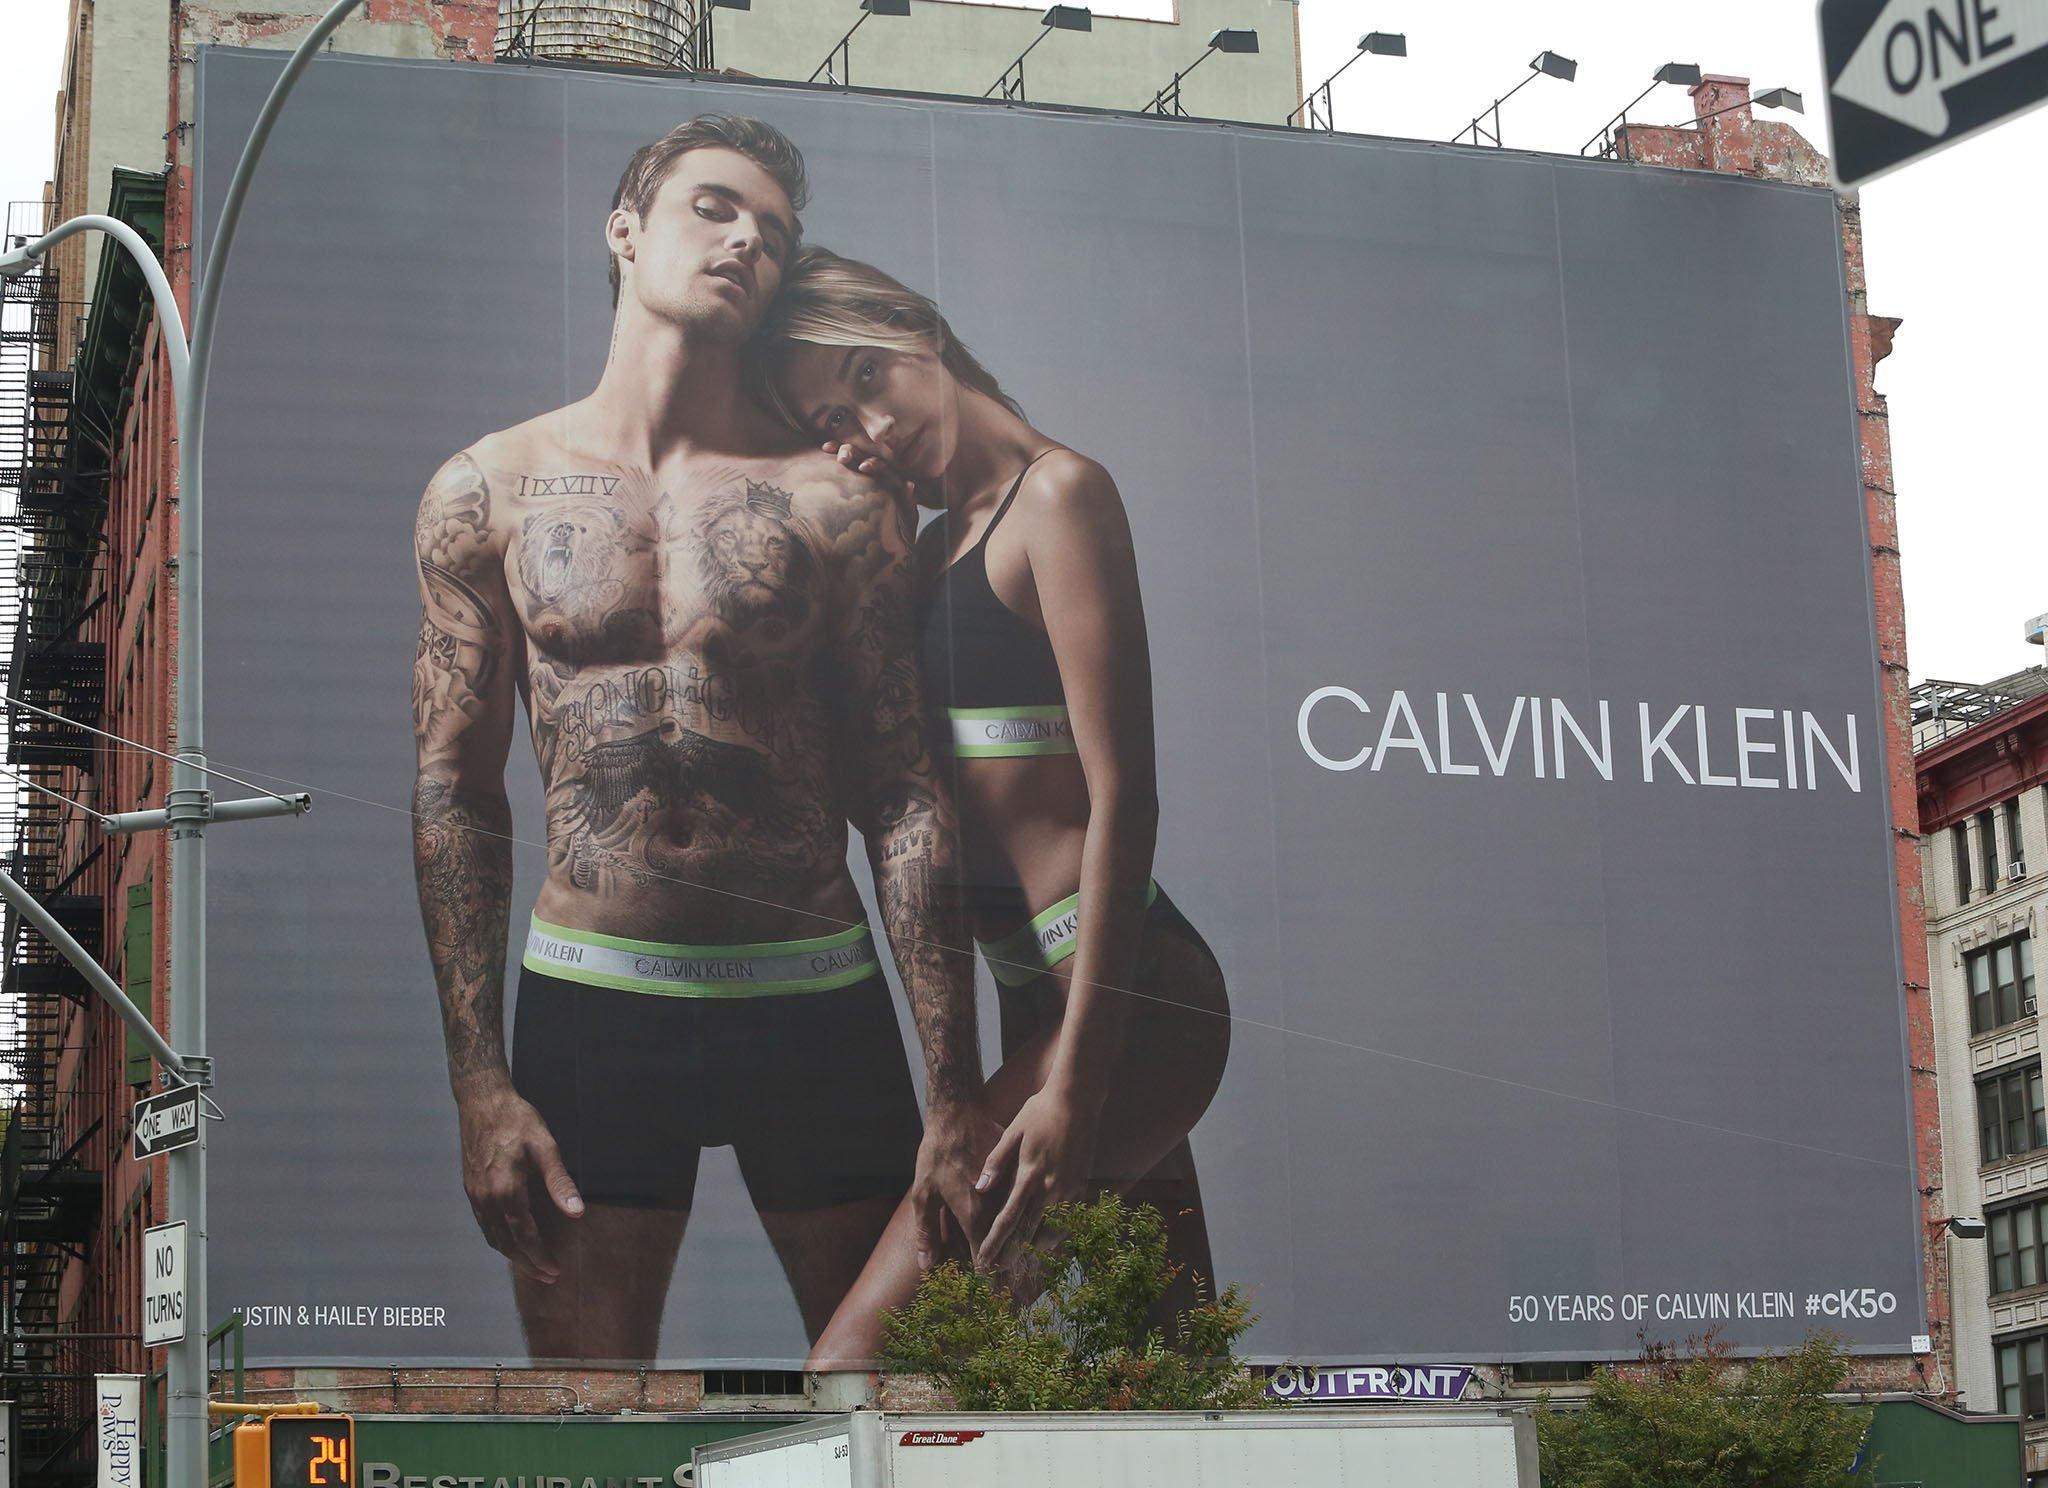 Justin Bieber and Hailey Bieber's Calvin Klein billboard in Soho, New York City